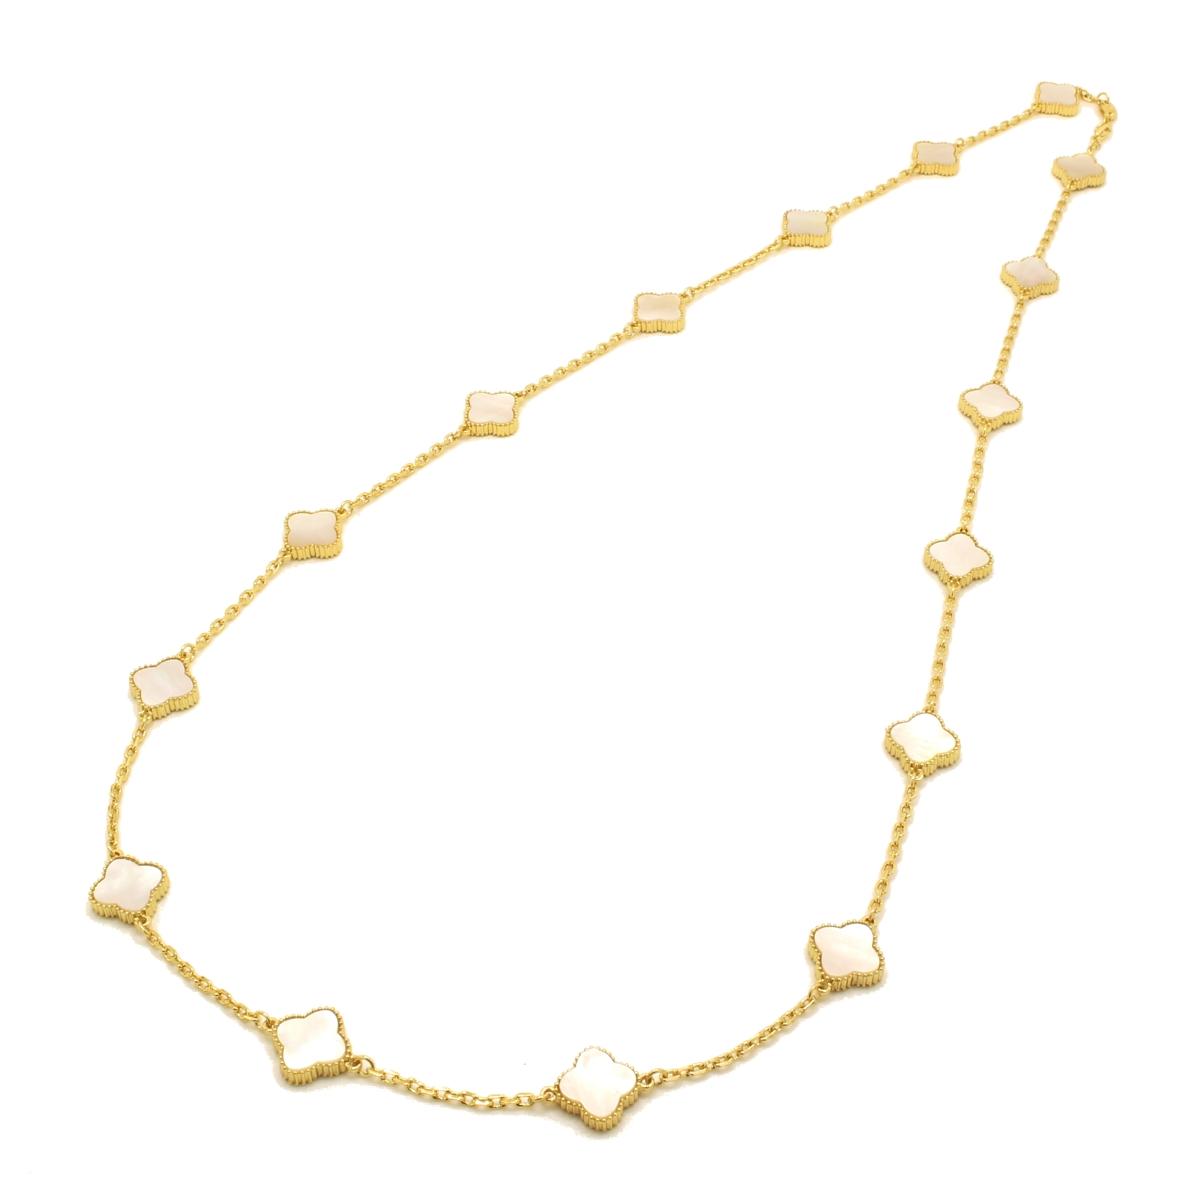 Preferred accessorykanon   Rakuten Global Market: Mil gold flower long  BA18